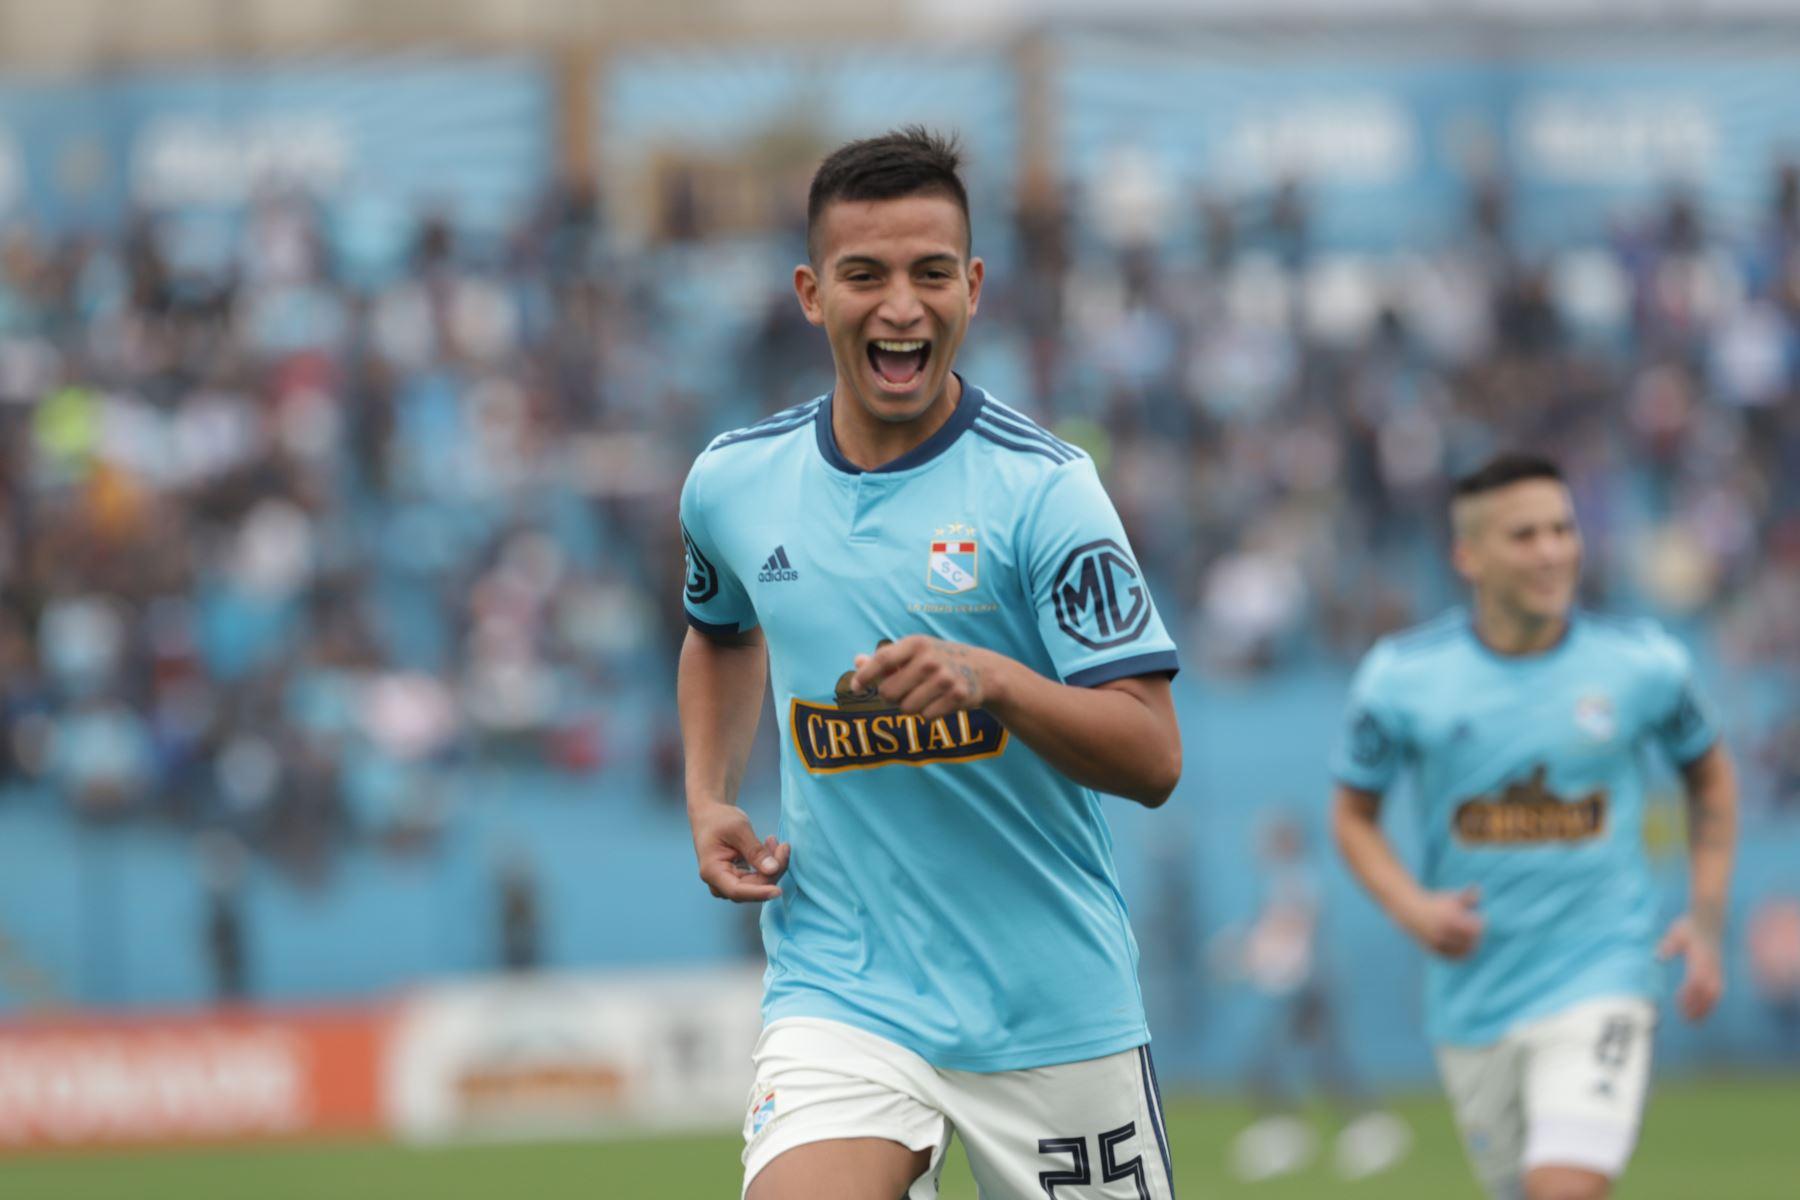 Sporting Cristal vs. Sport Boys se enfrentan  por la tercera jornada del Torneo Clausura 2019. Foto: ANDINA/Jorge Tello